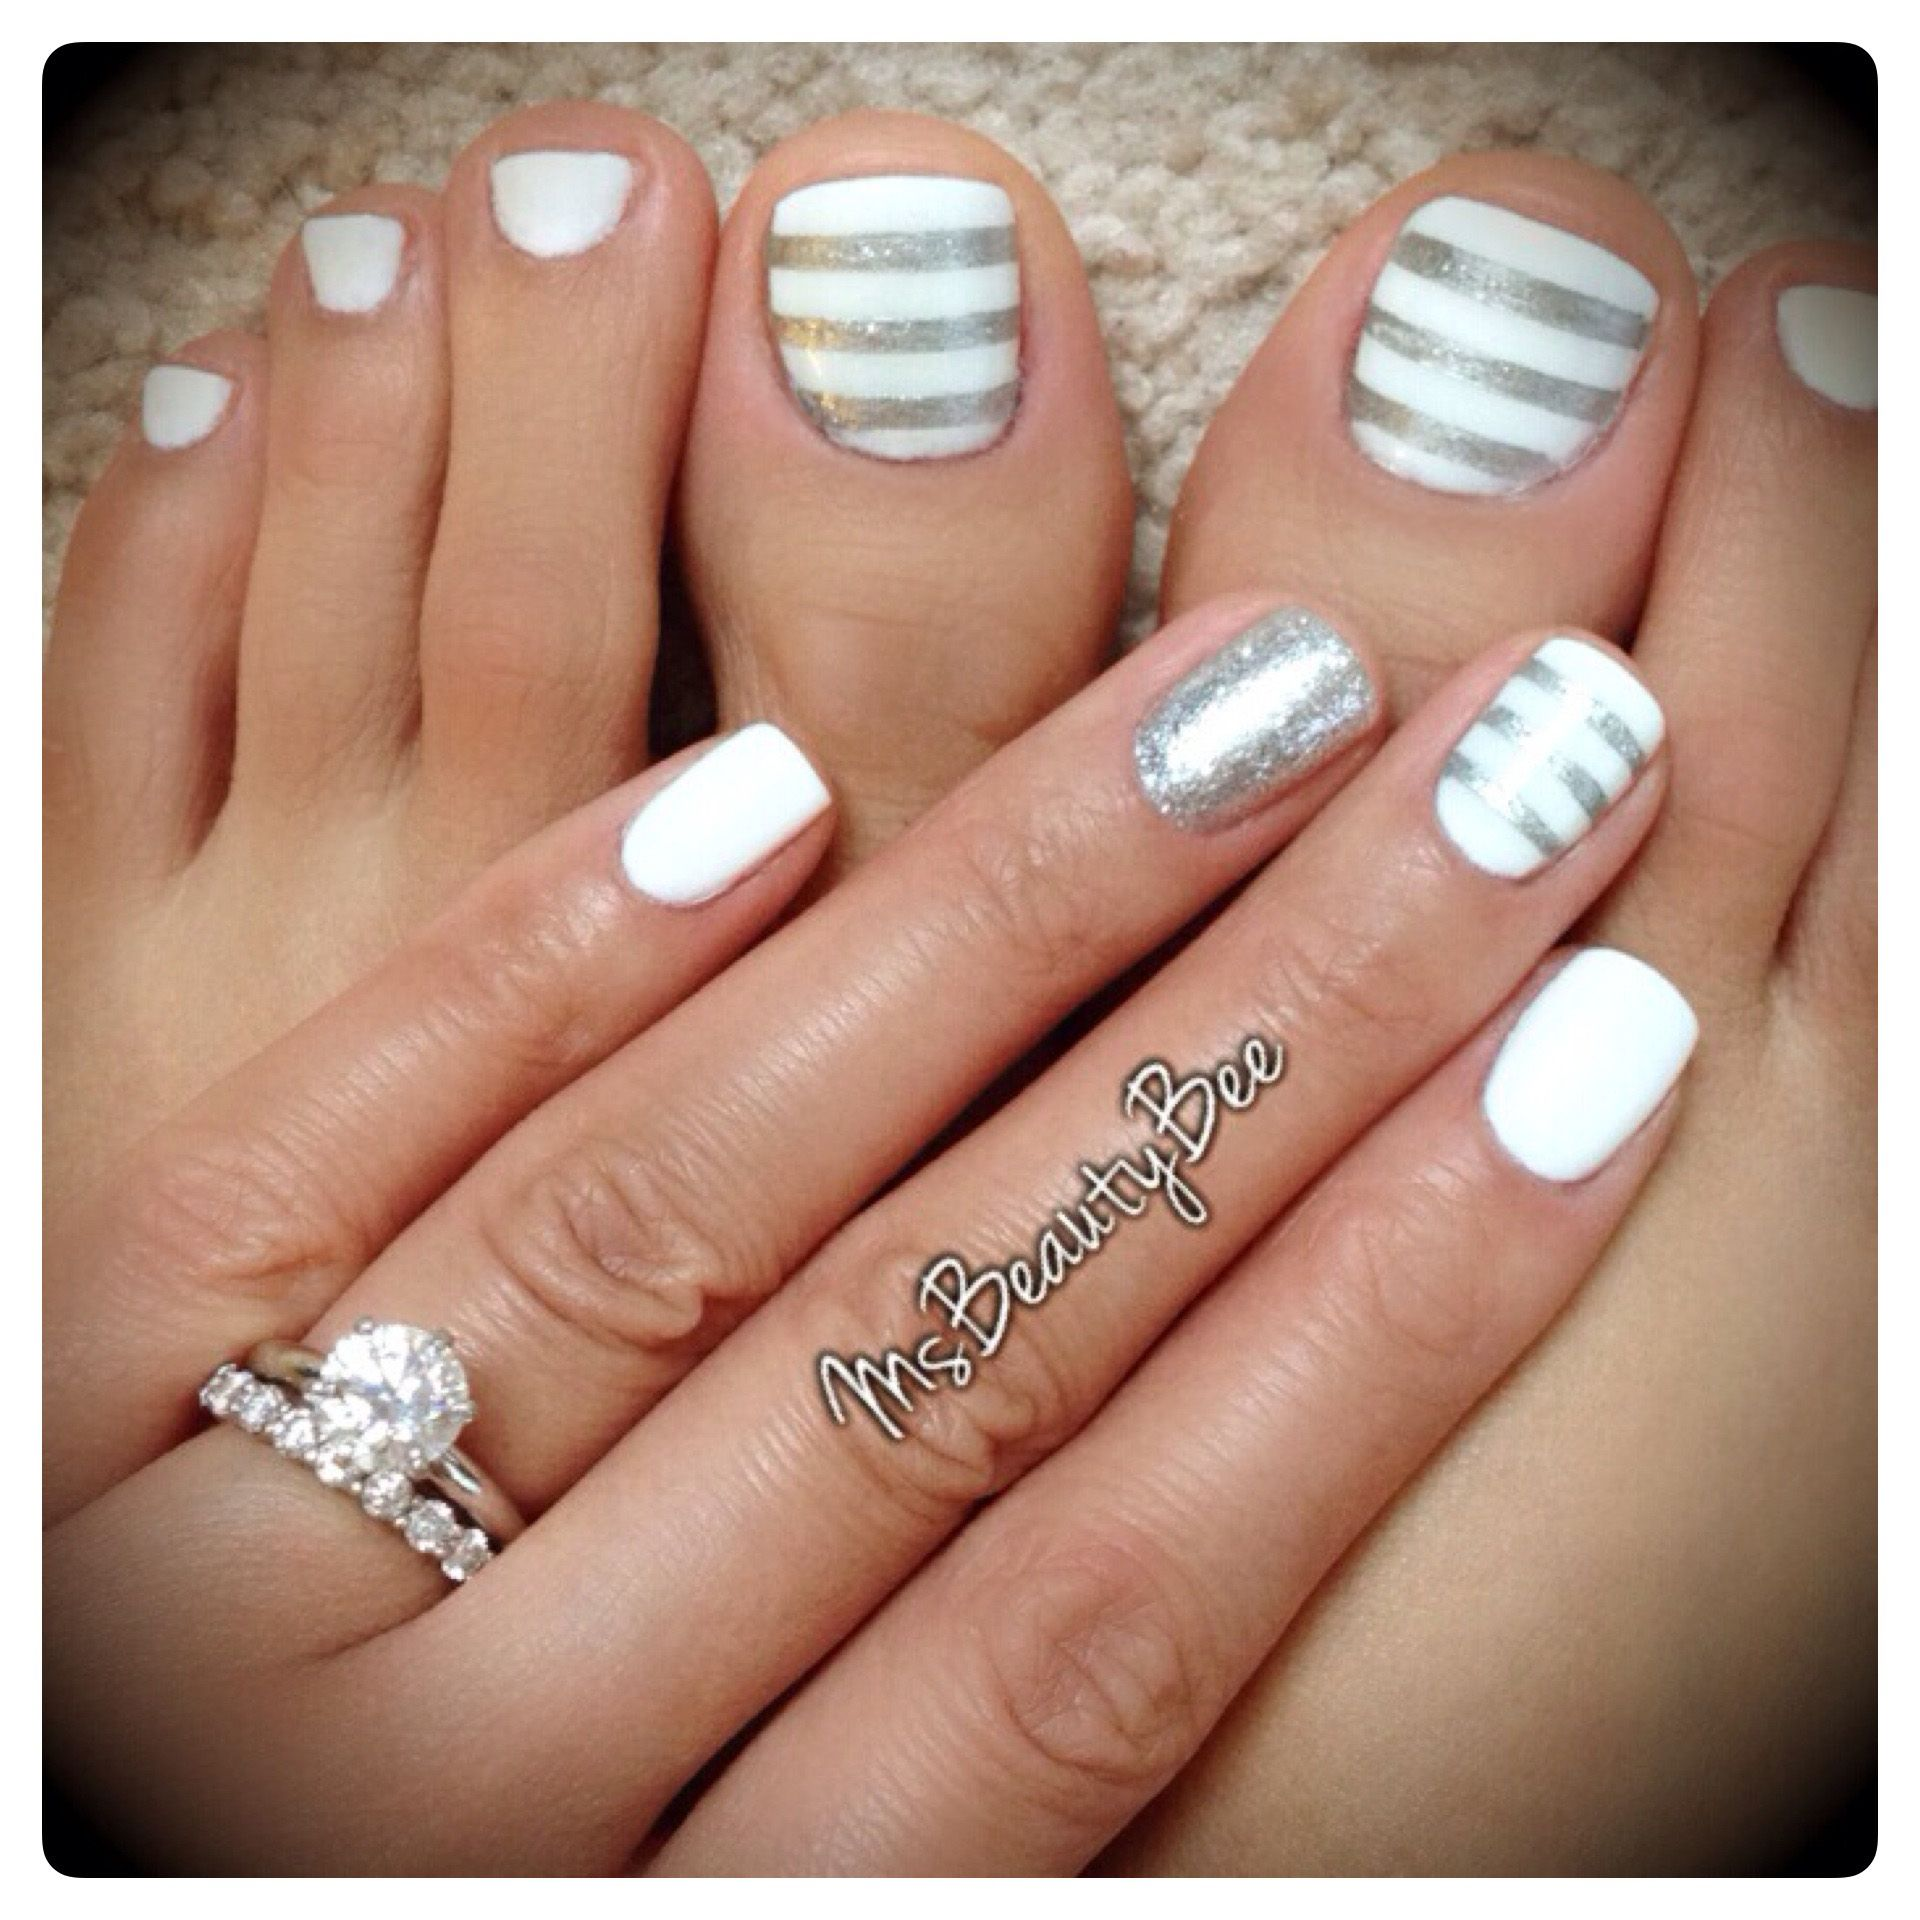 Pin by LINA ARIAS on Uñas | Pinterest | Mani pedi, Glitter nails and ...